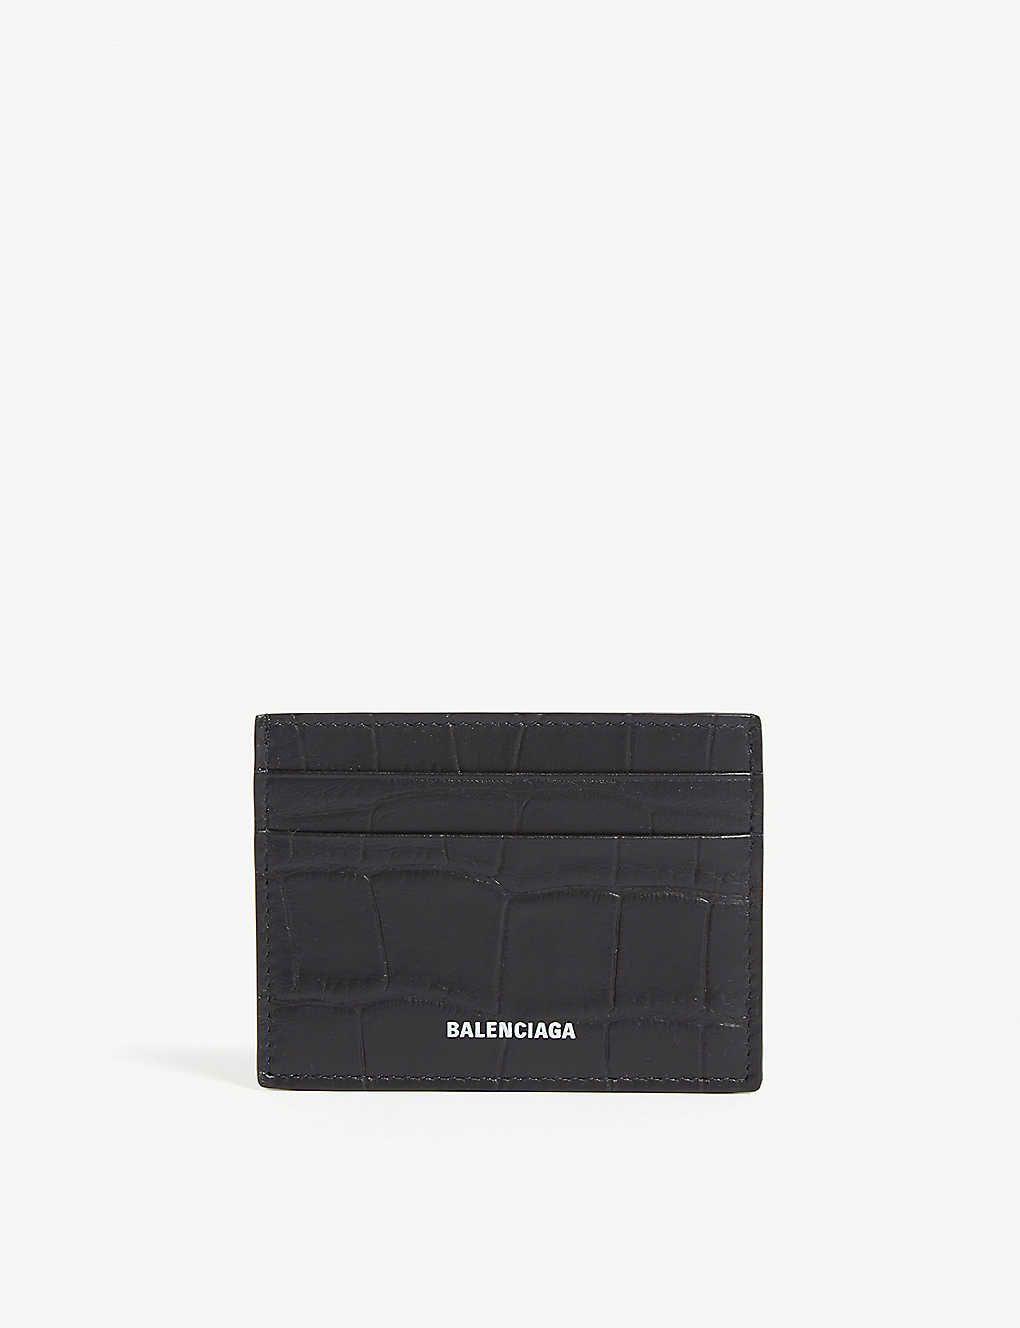 Logo Croc Embossed Leather Card Holder Card Holder Leather Card Holder Embossed Leather